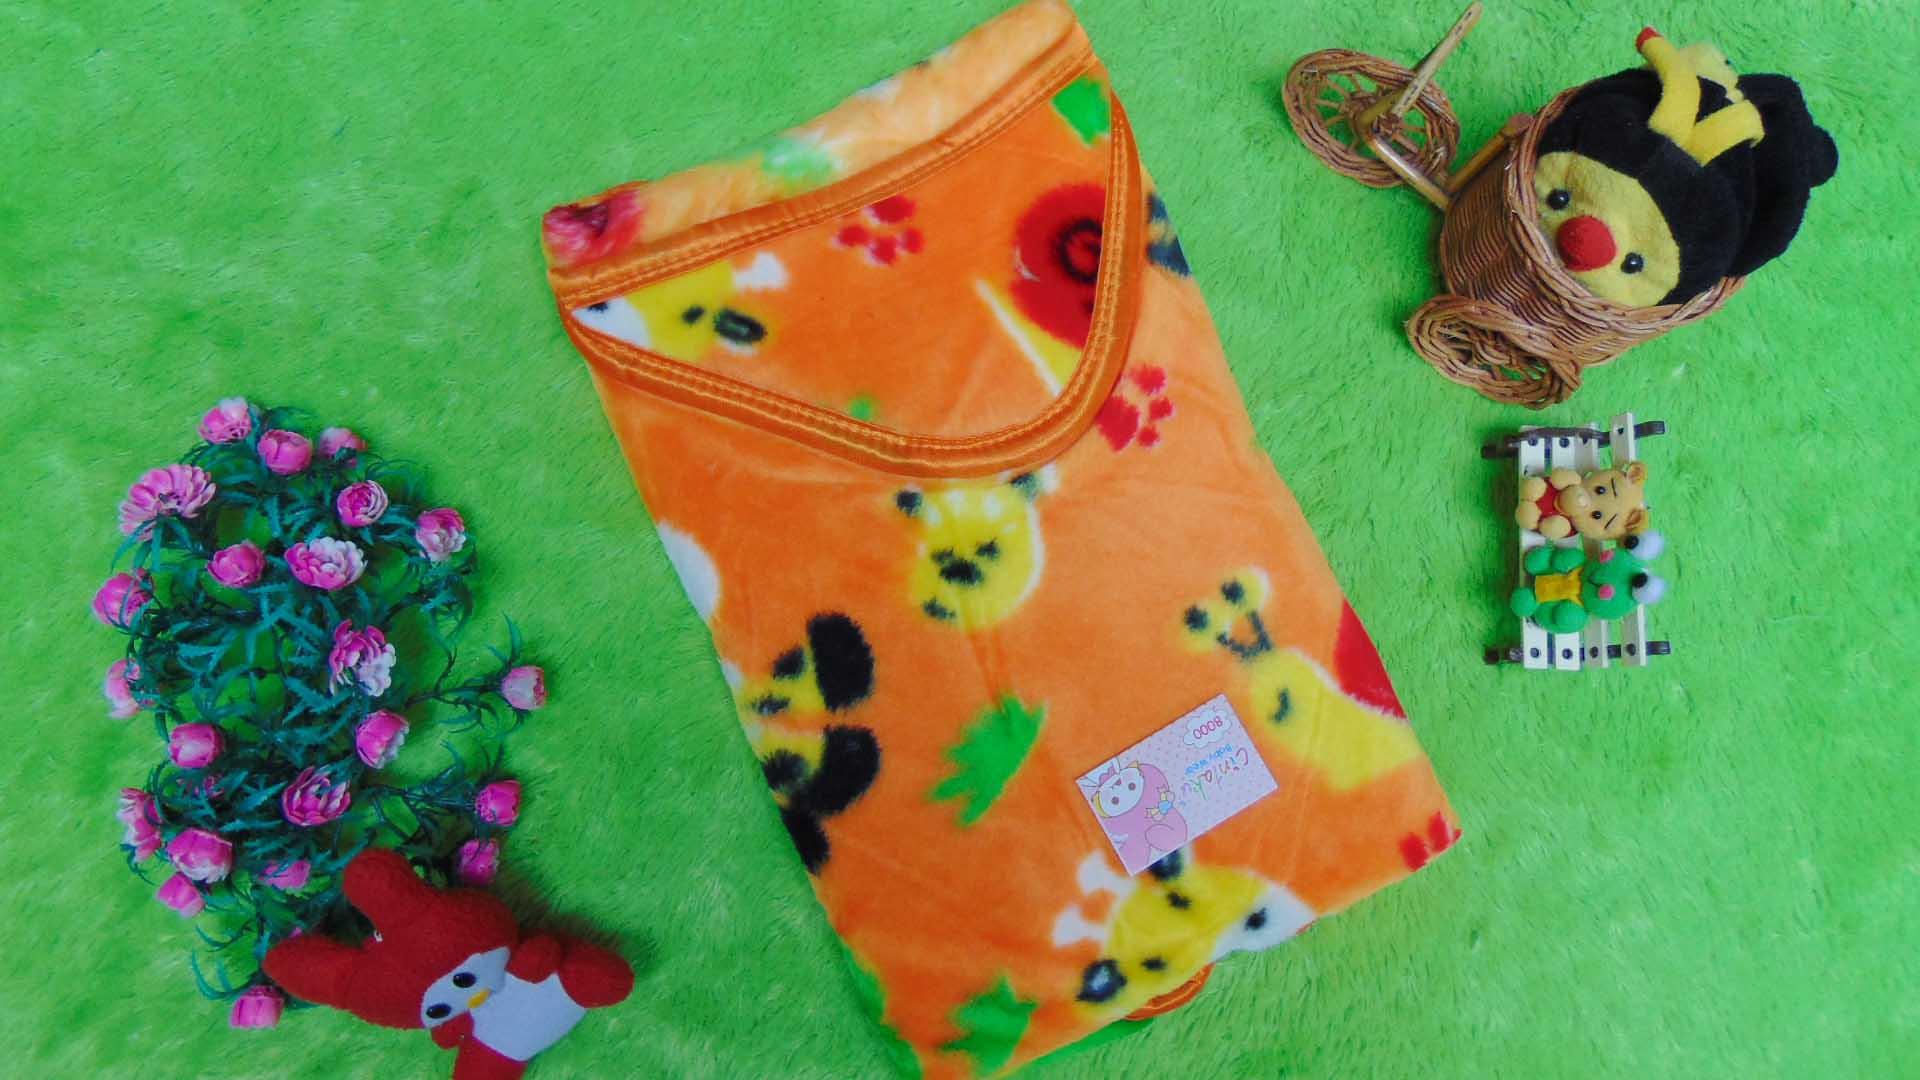 kado bayi selimut bayi bulu topi selimut bepergian bayi bludru lembut motif jerapah orange 40 bahan lembut cocok sebagai pelindung bayi ketika bepergian (1)